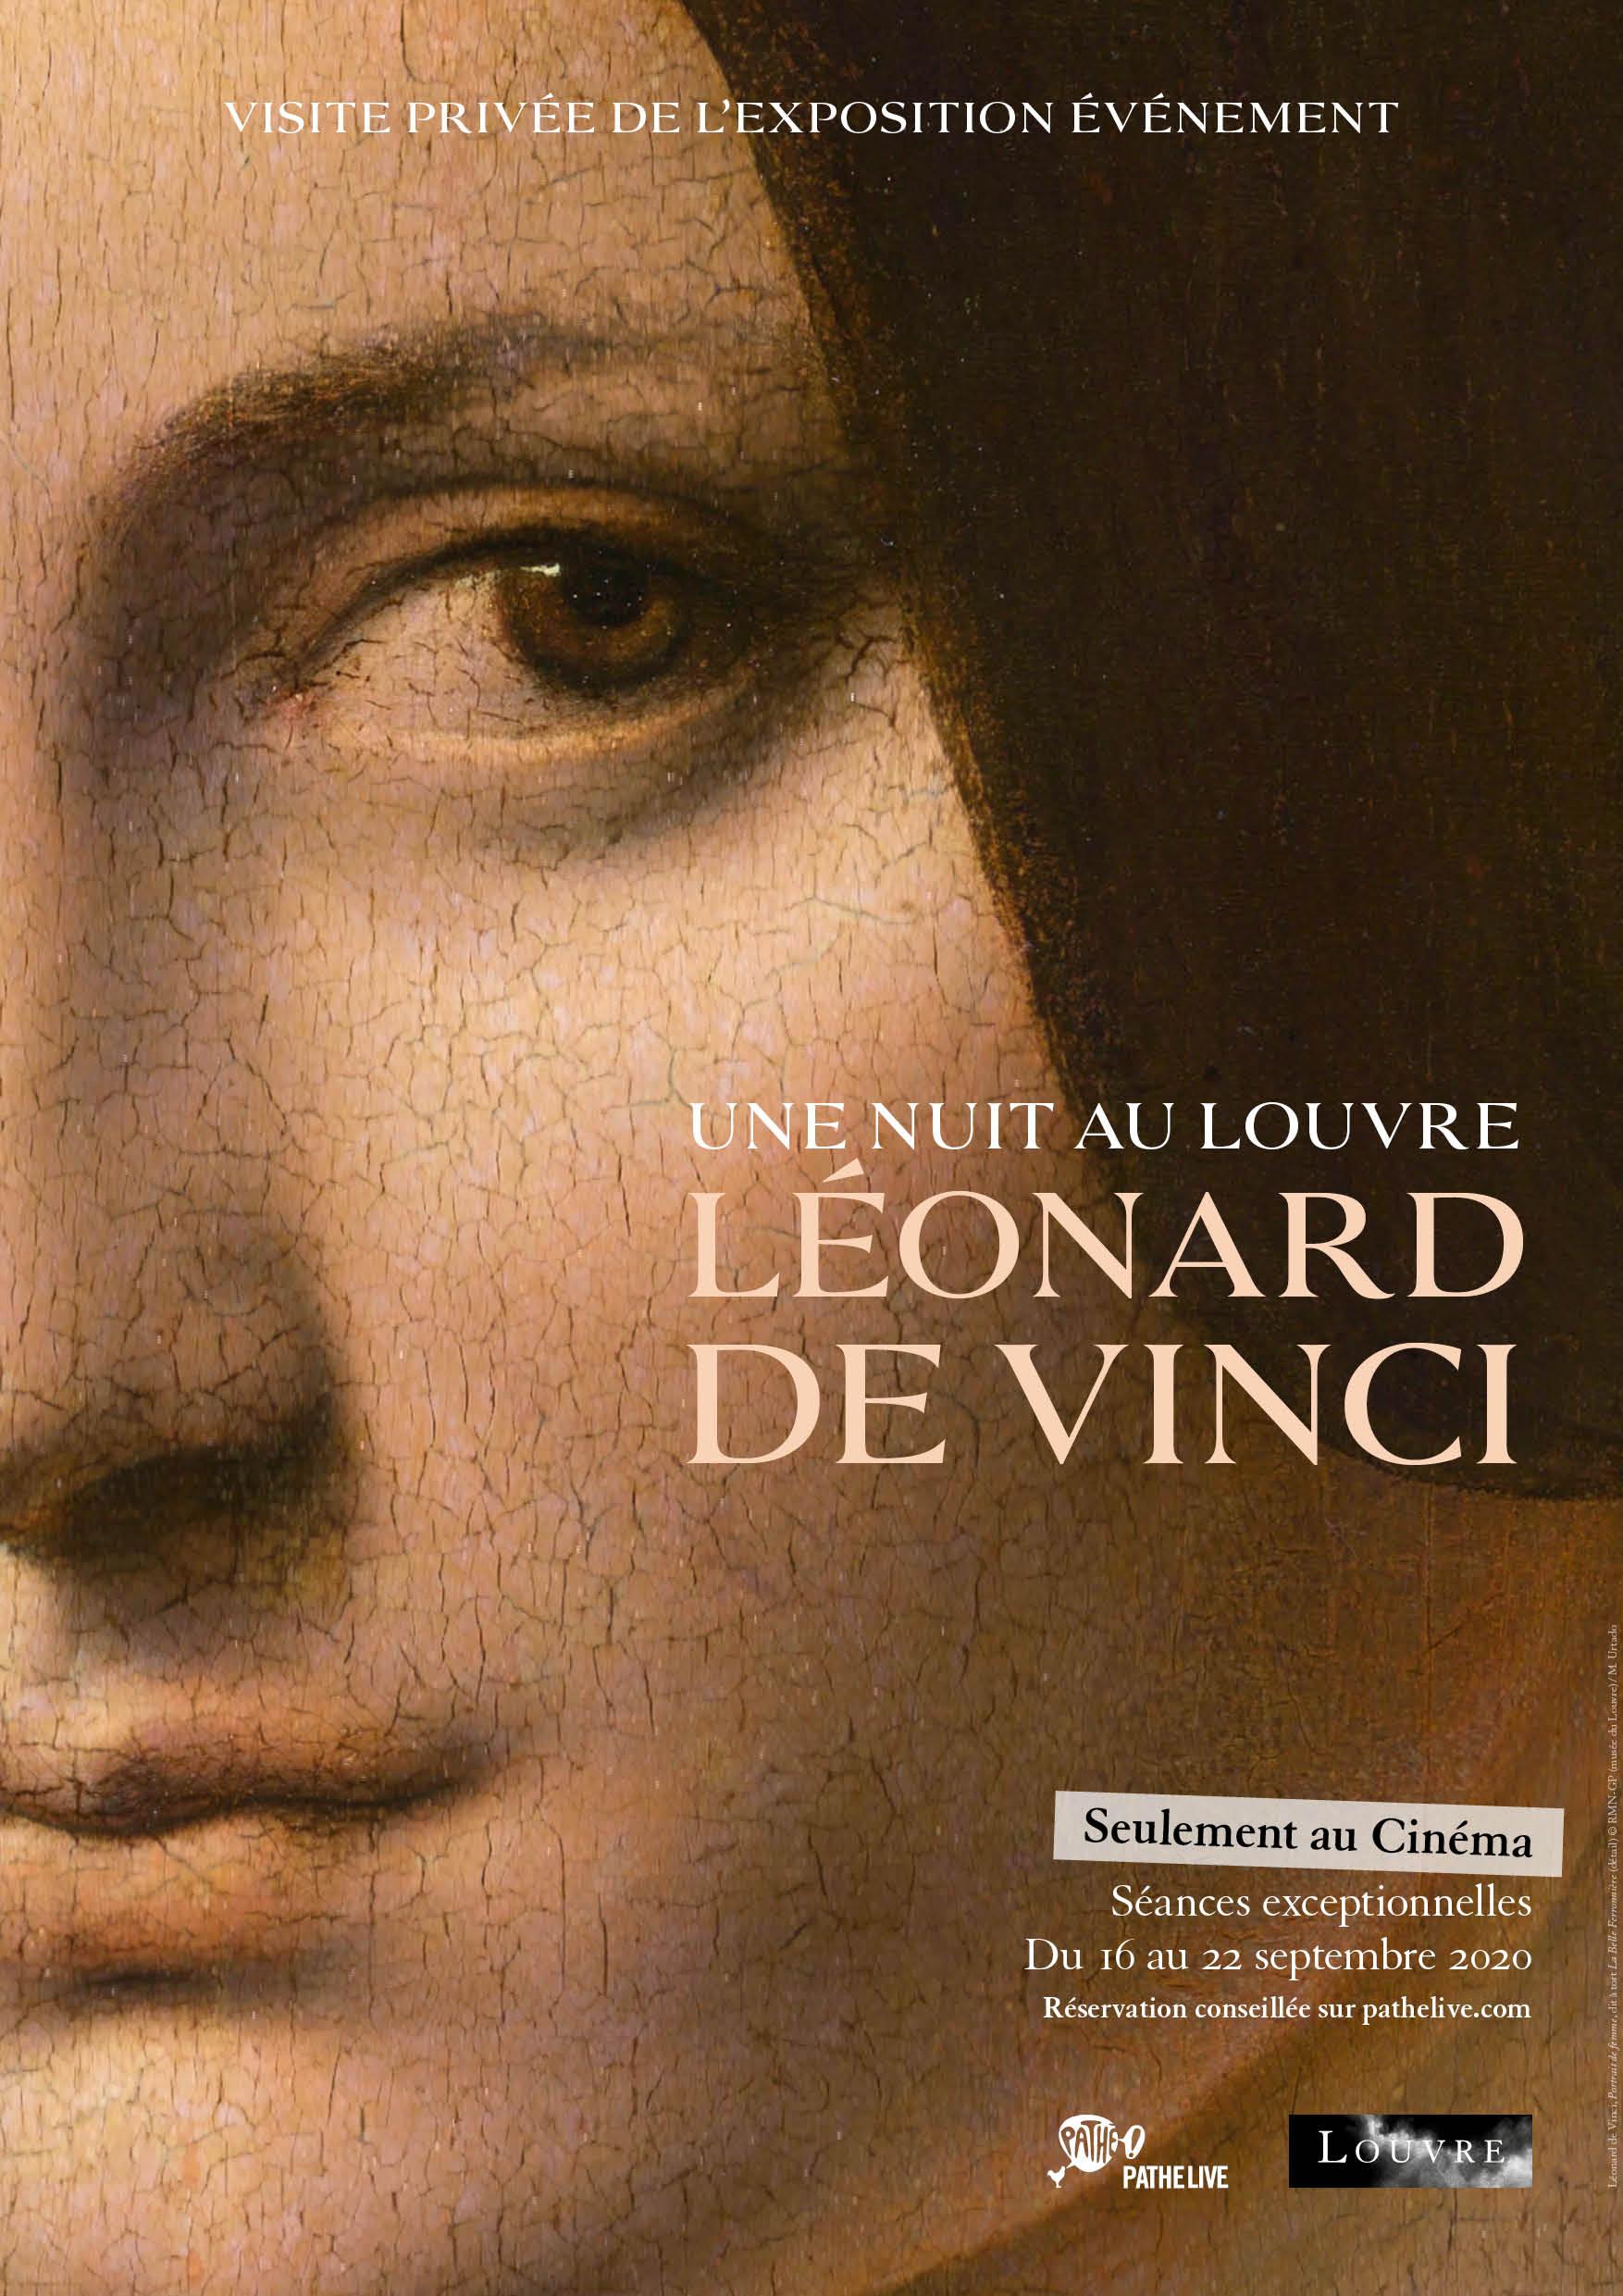 Archivé: UNE NUIT AU LOUVRE : LEONARD DE VINCI / AU CINEMA